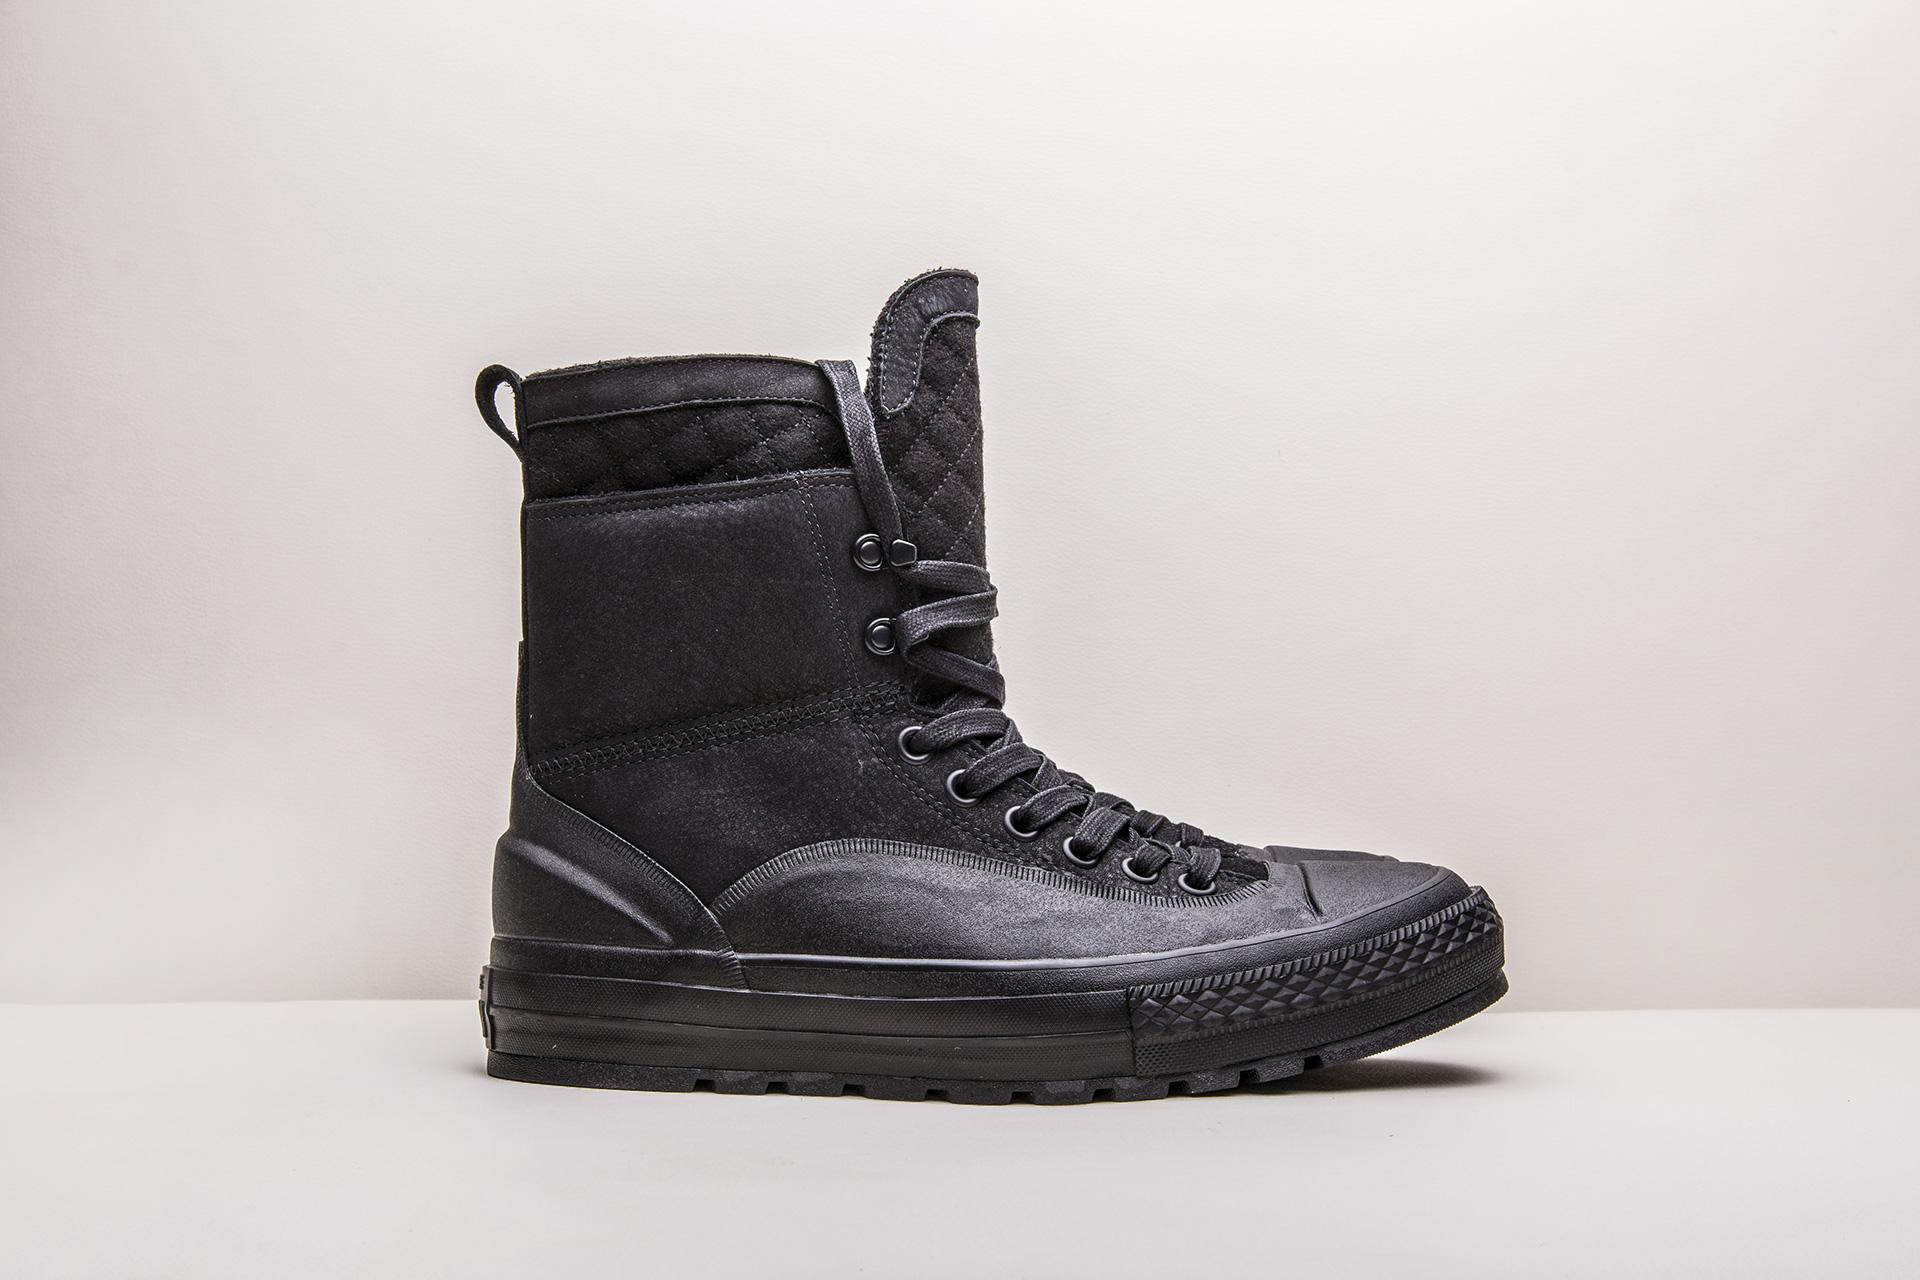 Купить черные мужские кеды All Star Tekoa X-Hi от Converse (153577 ... 677b8e37a7112